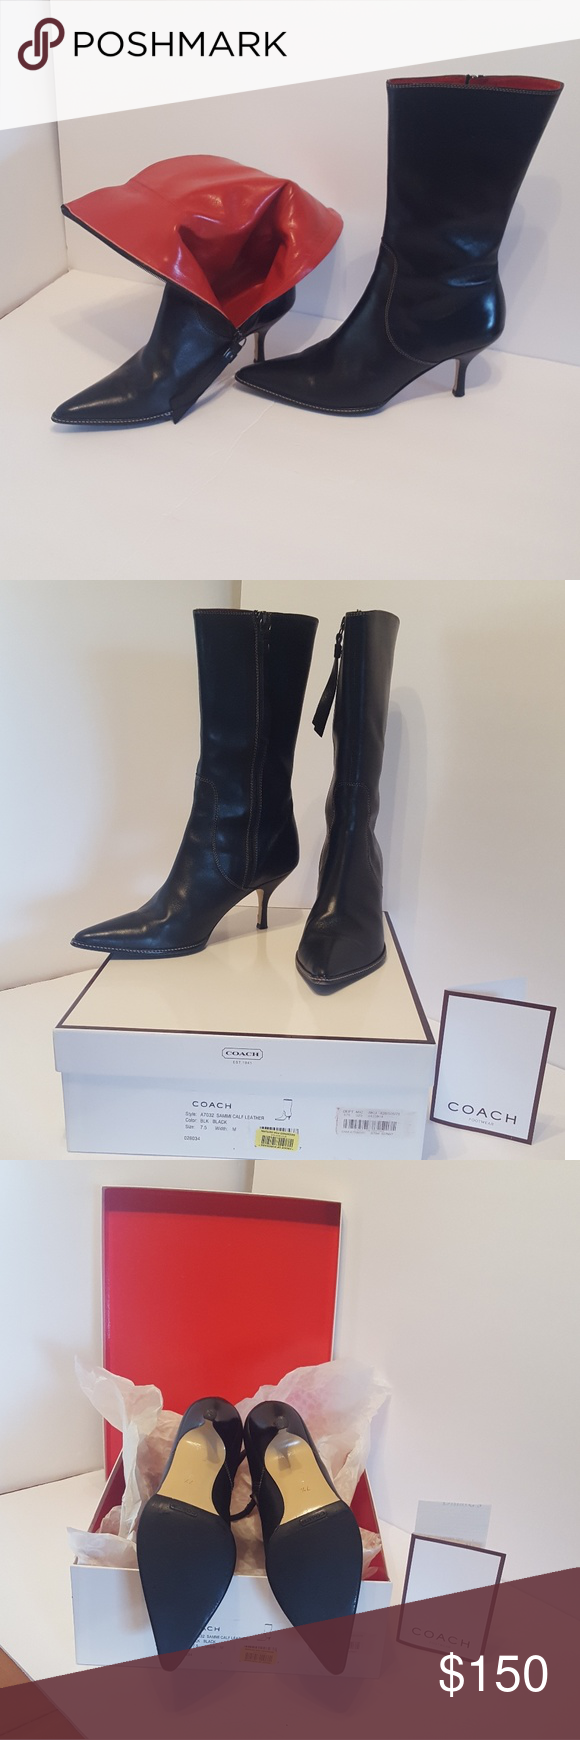 e00f35981cd24 Vintage Coach Sammi Black Leather Boots 7.5 B $350 A7032 SAMMI CALF ...